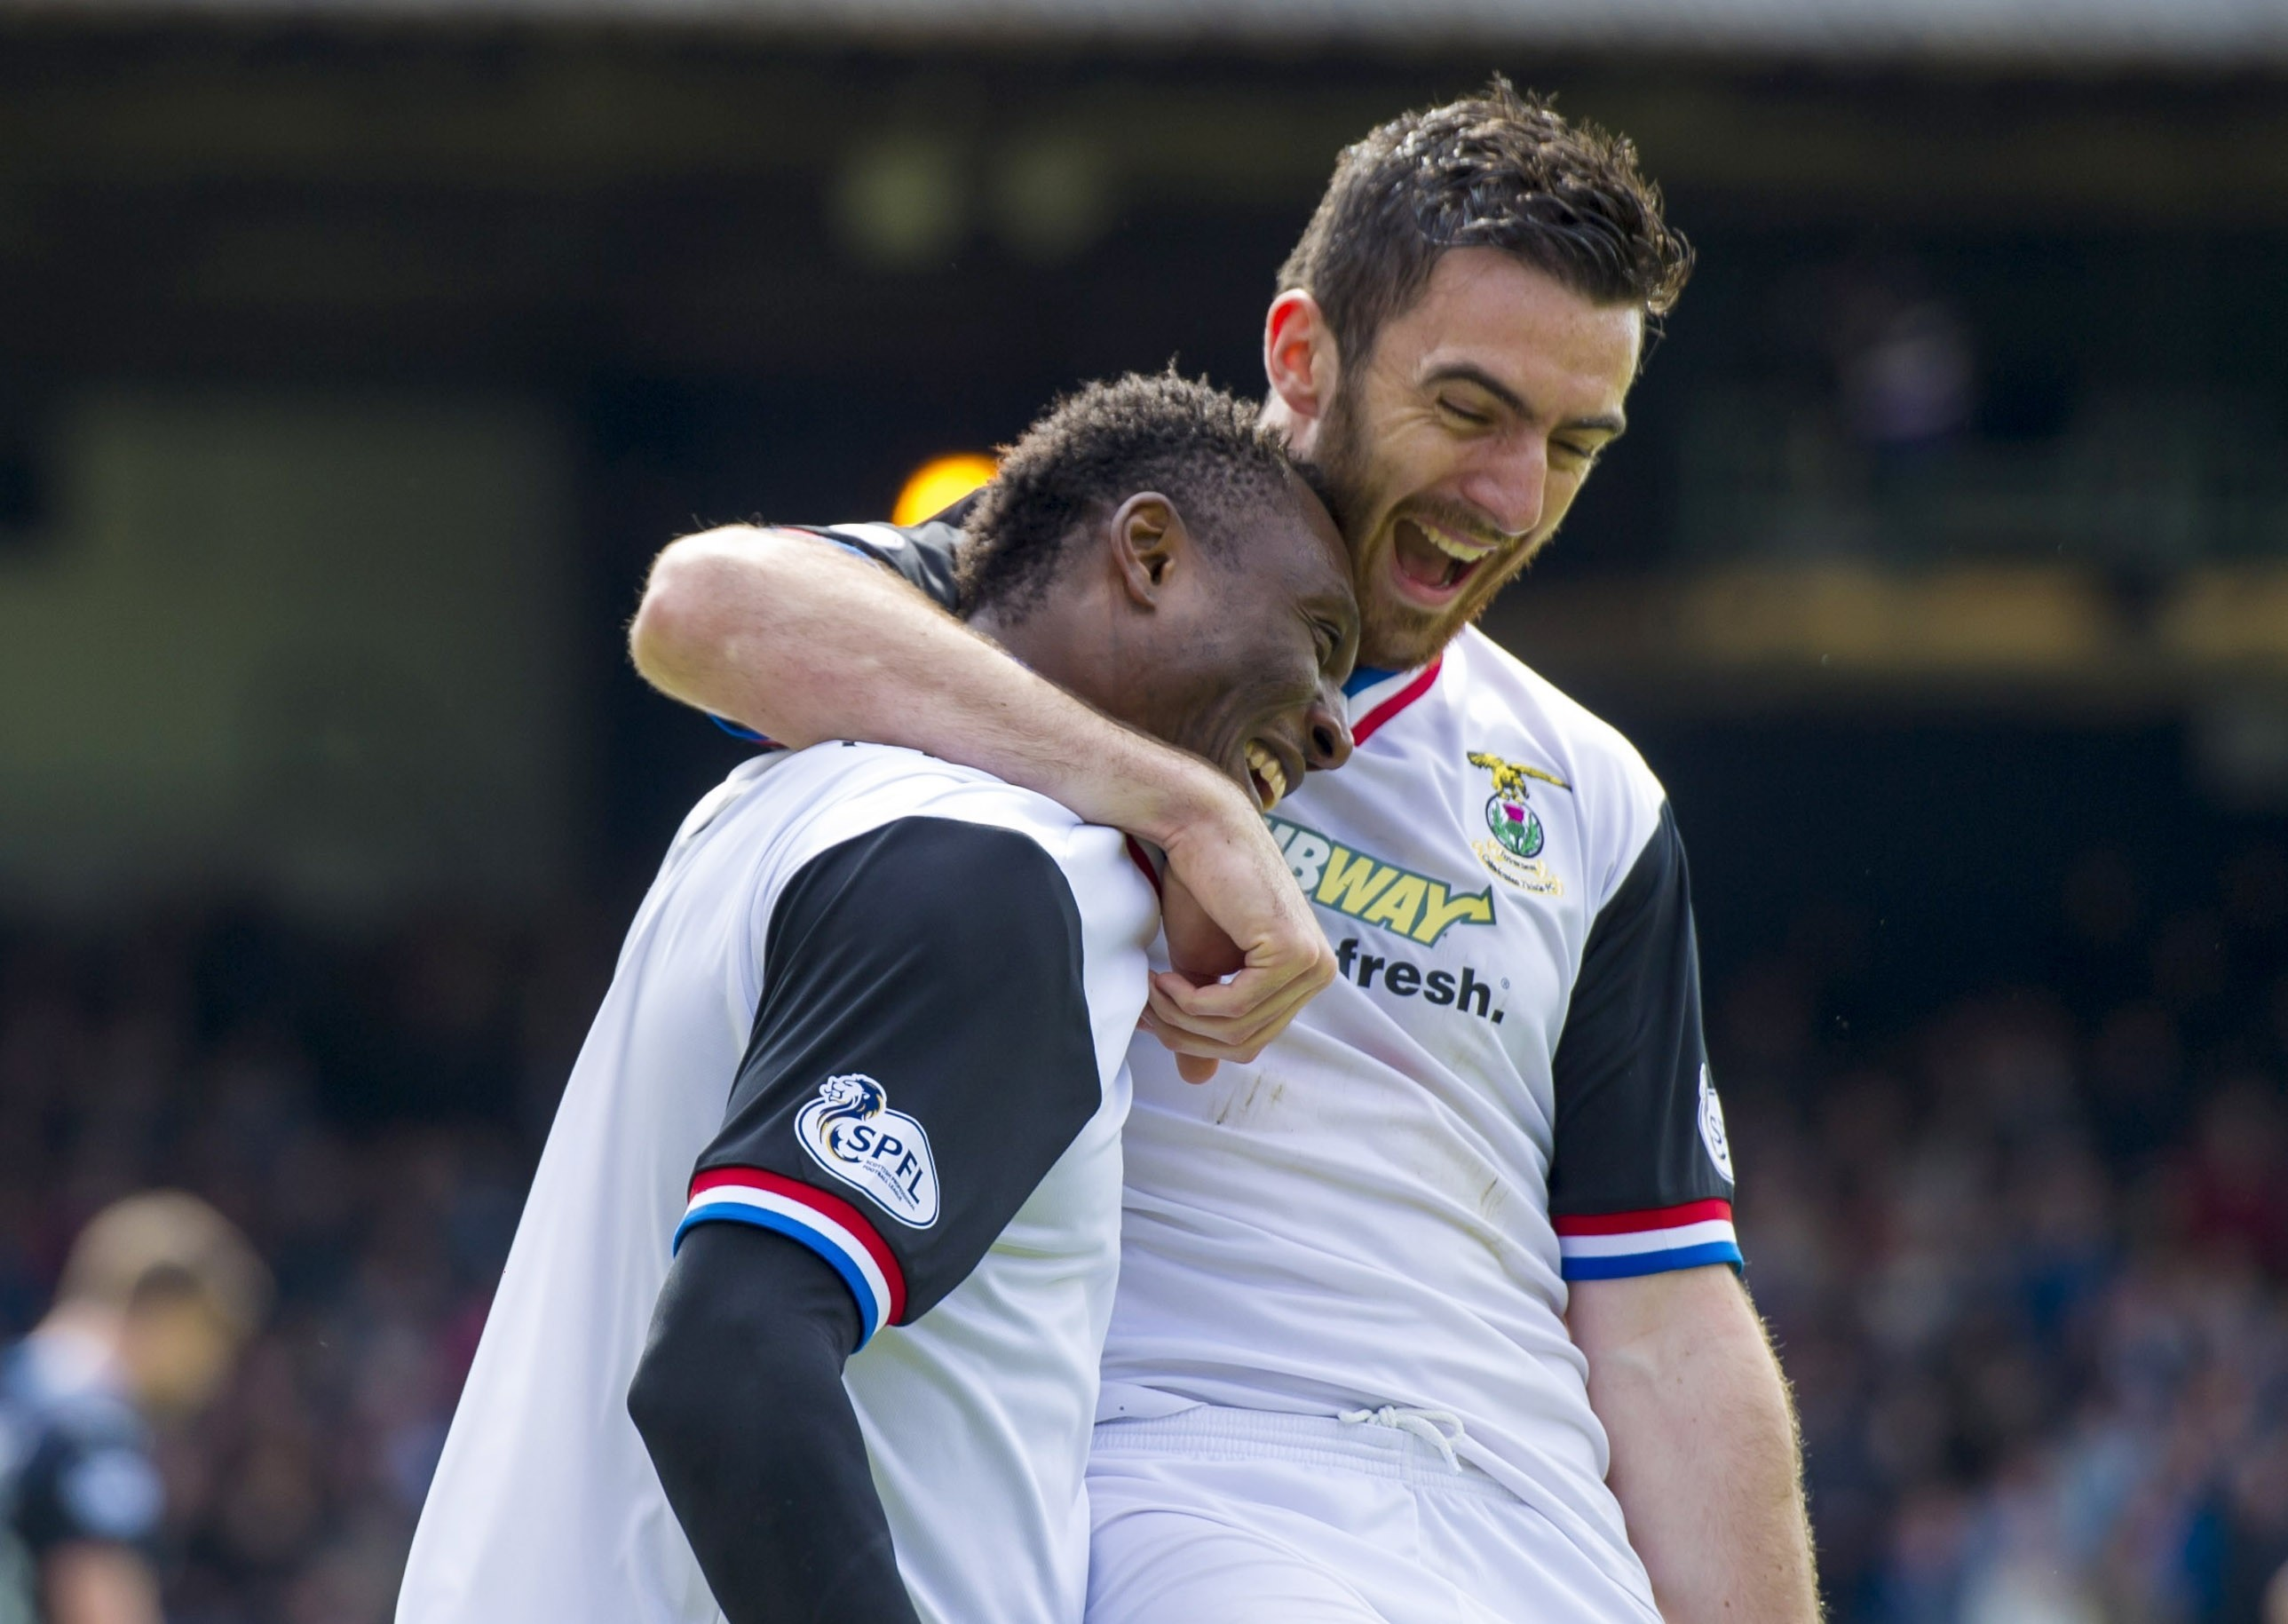 Ross Draper congratulates Eddie Ofere on his winning goal